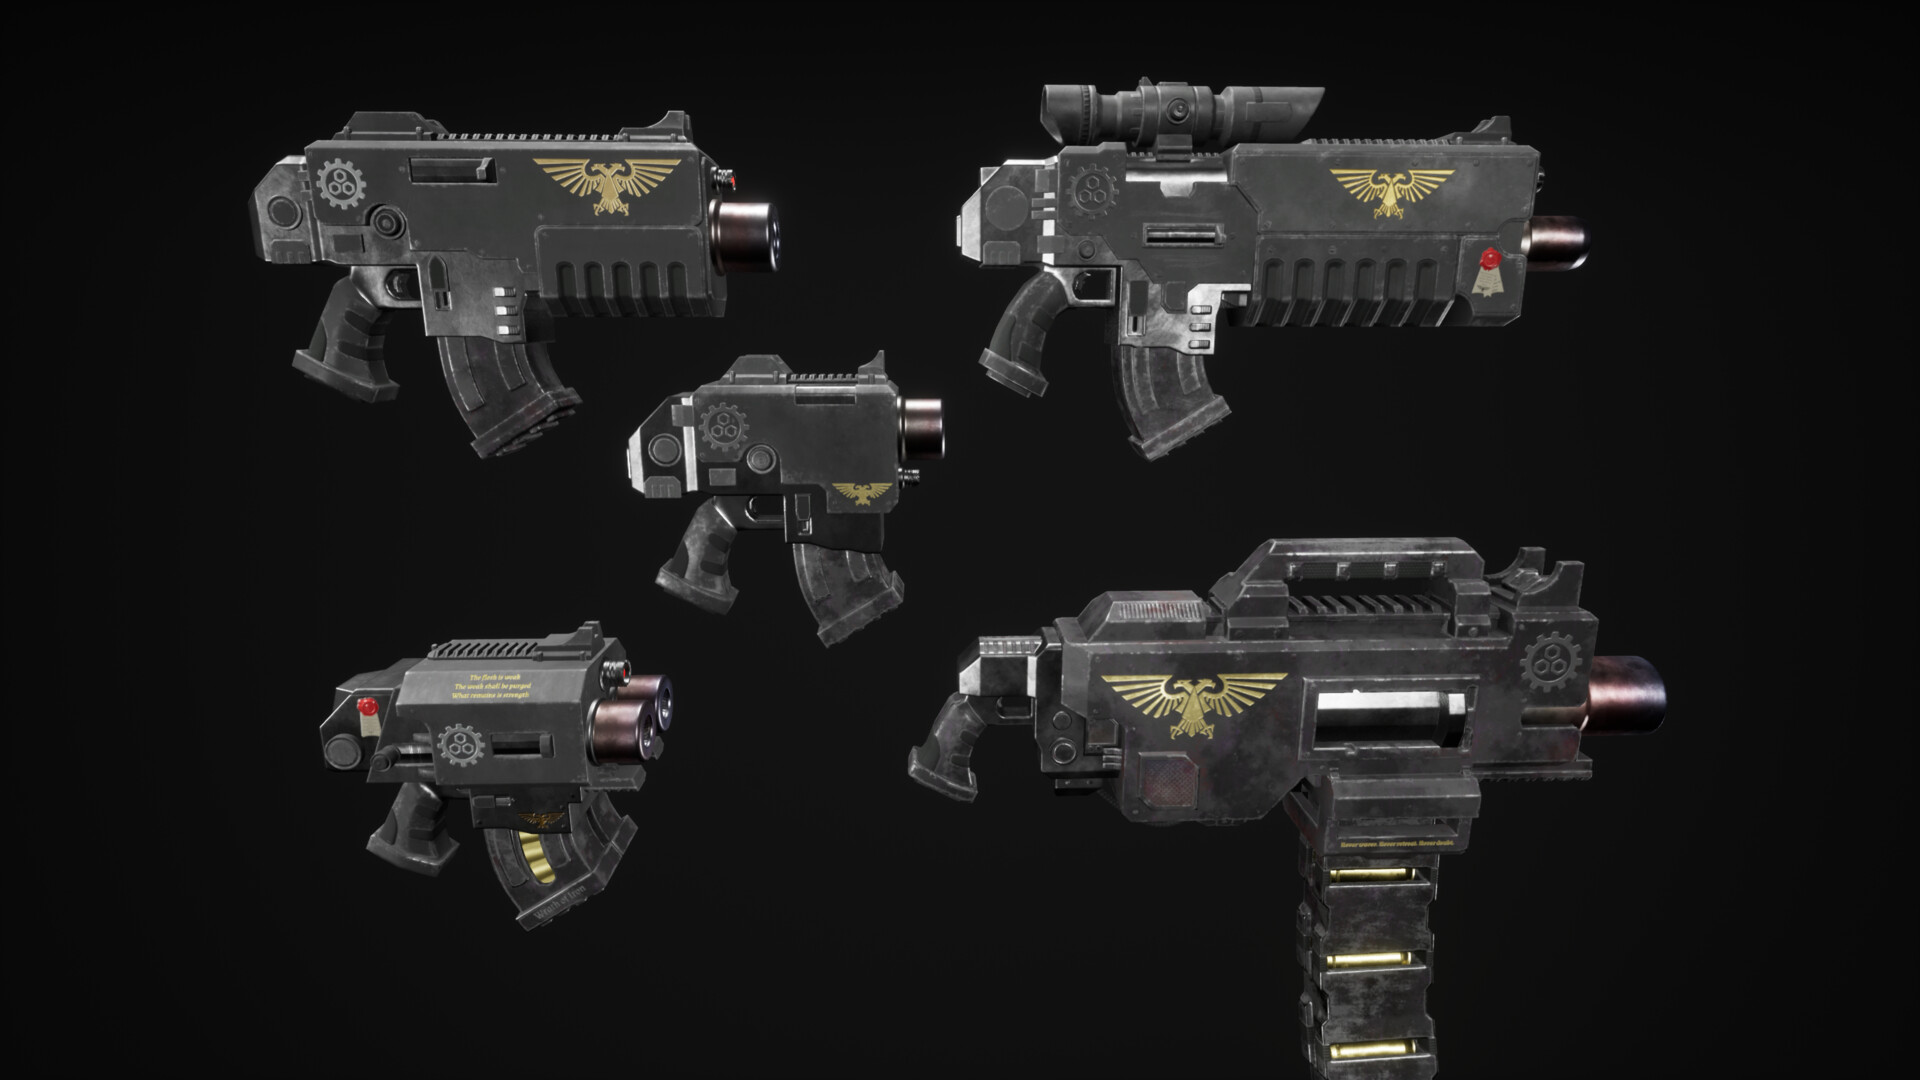 From top left to bottom right: Bolter, Bolt Rifle, Bolt Pistol, Storm Bolter, Heavy Bolter